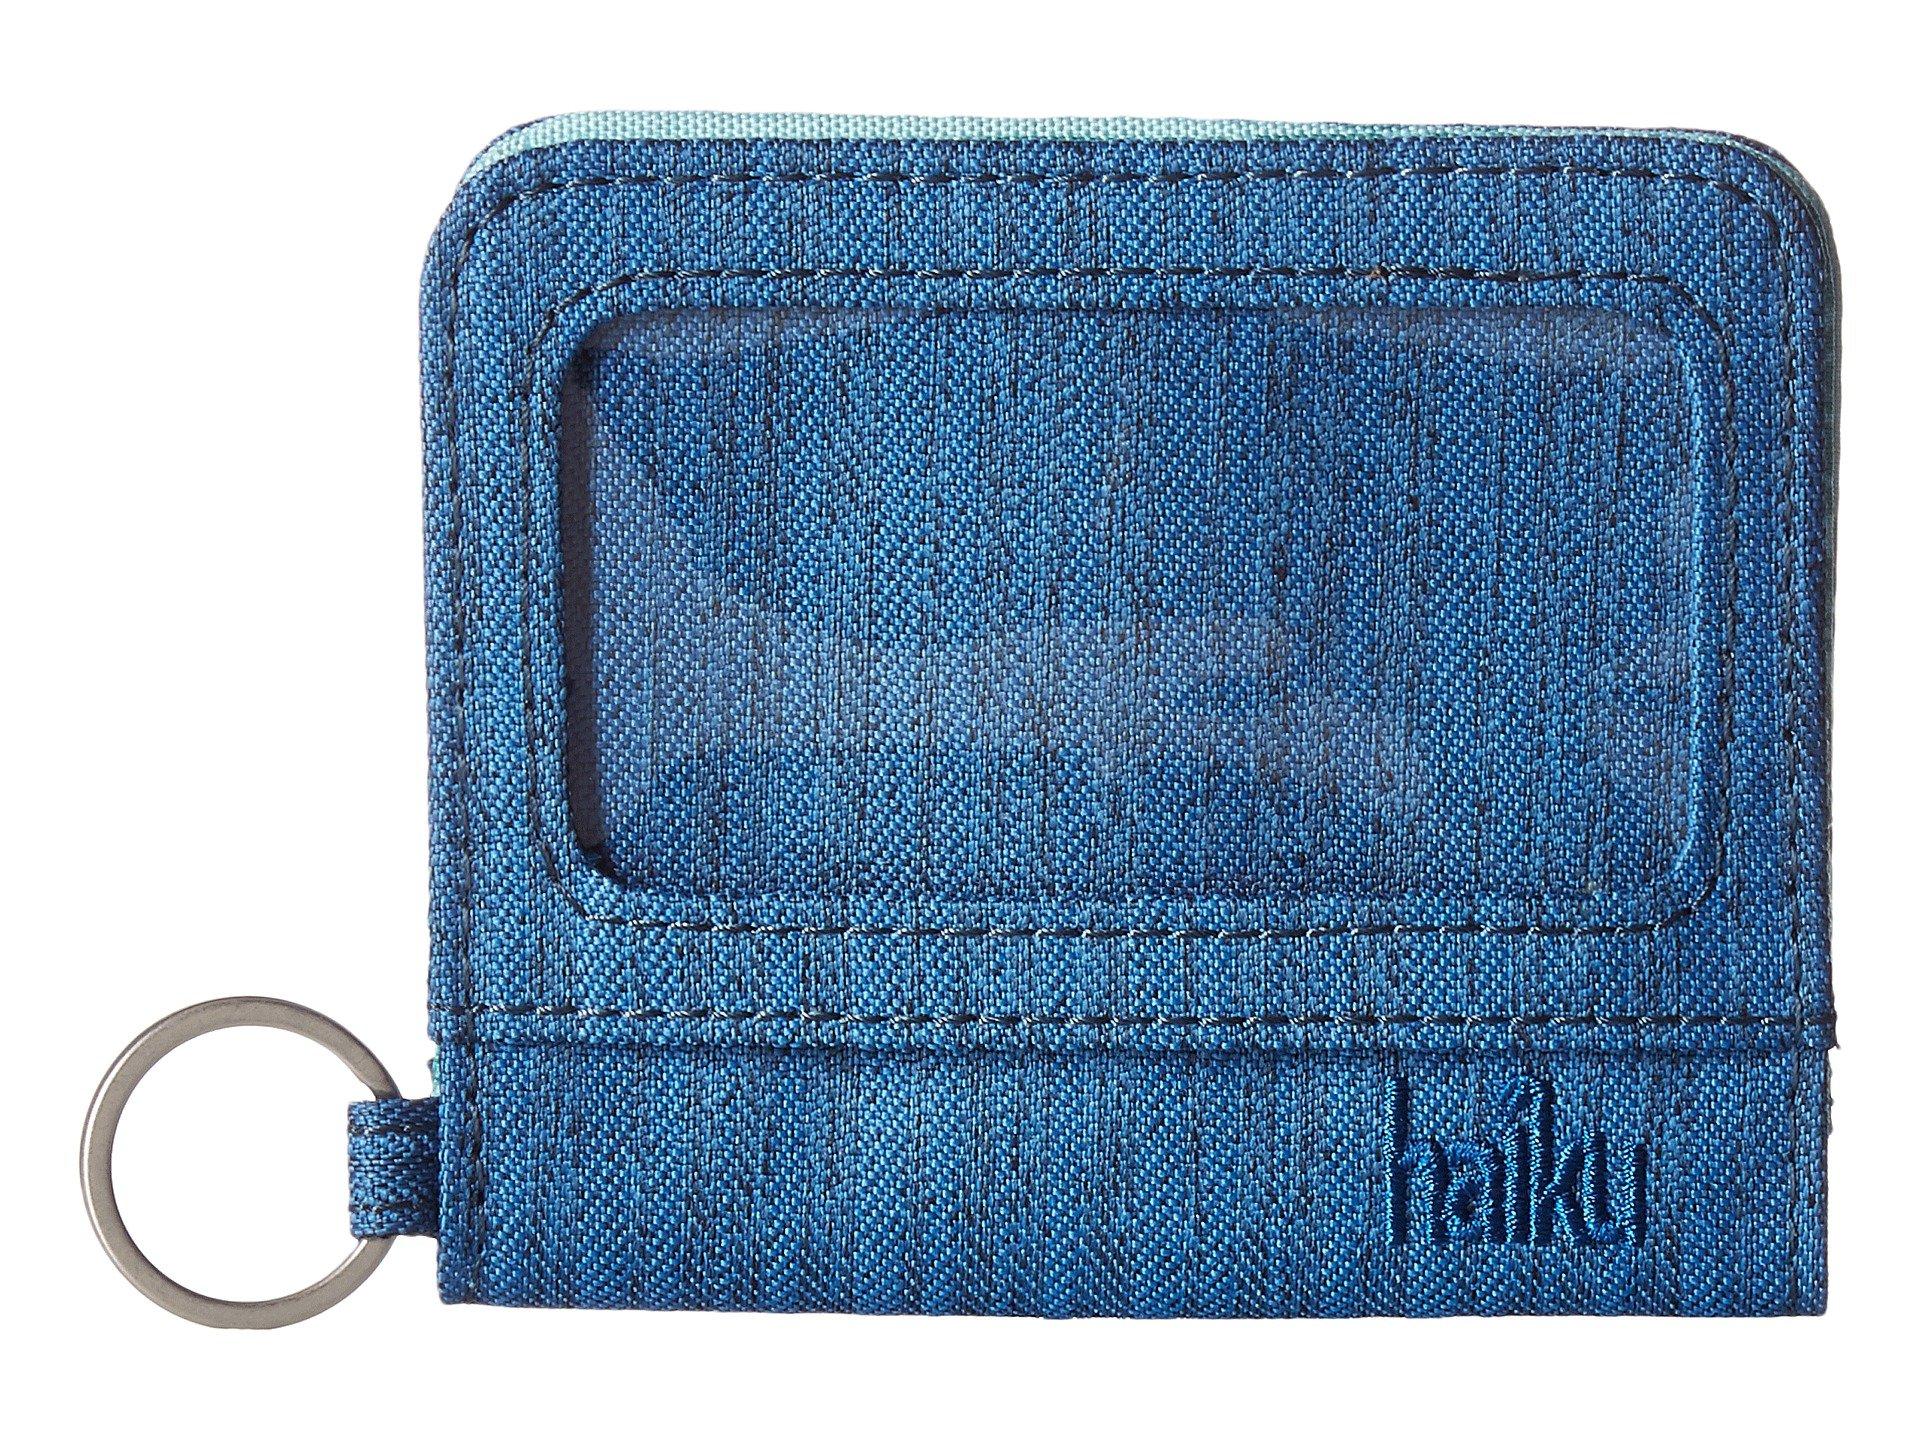 Sapphire Lanyard Wallet Sapphire Haiku Access Wallet Access Haiku Lanyard wF8g46